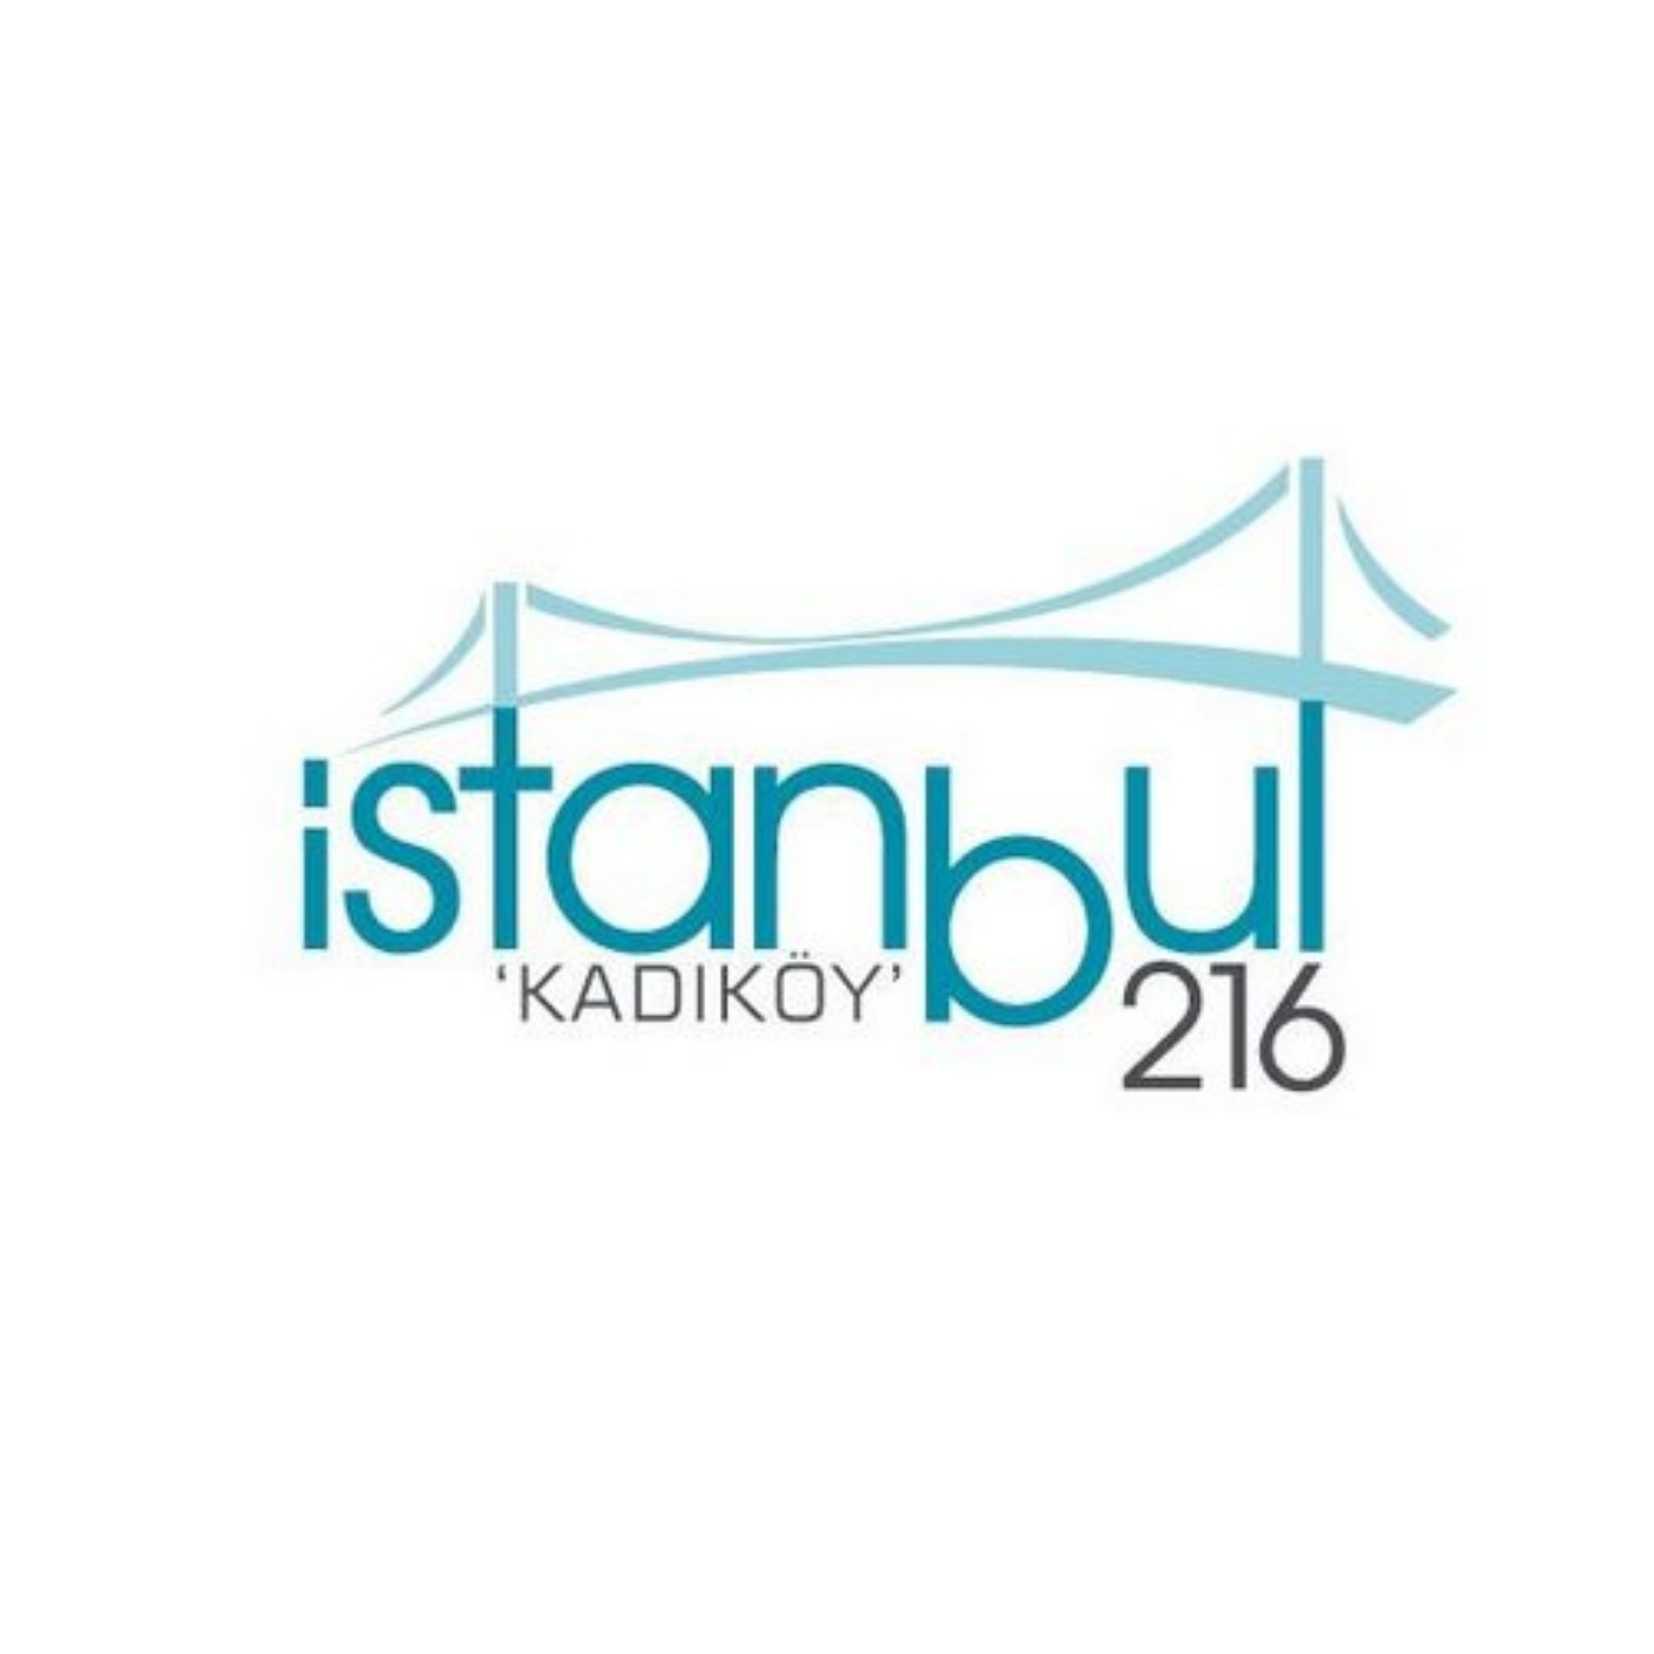 Listing Istanbul 216 Logo